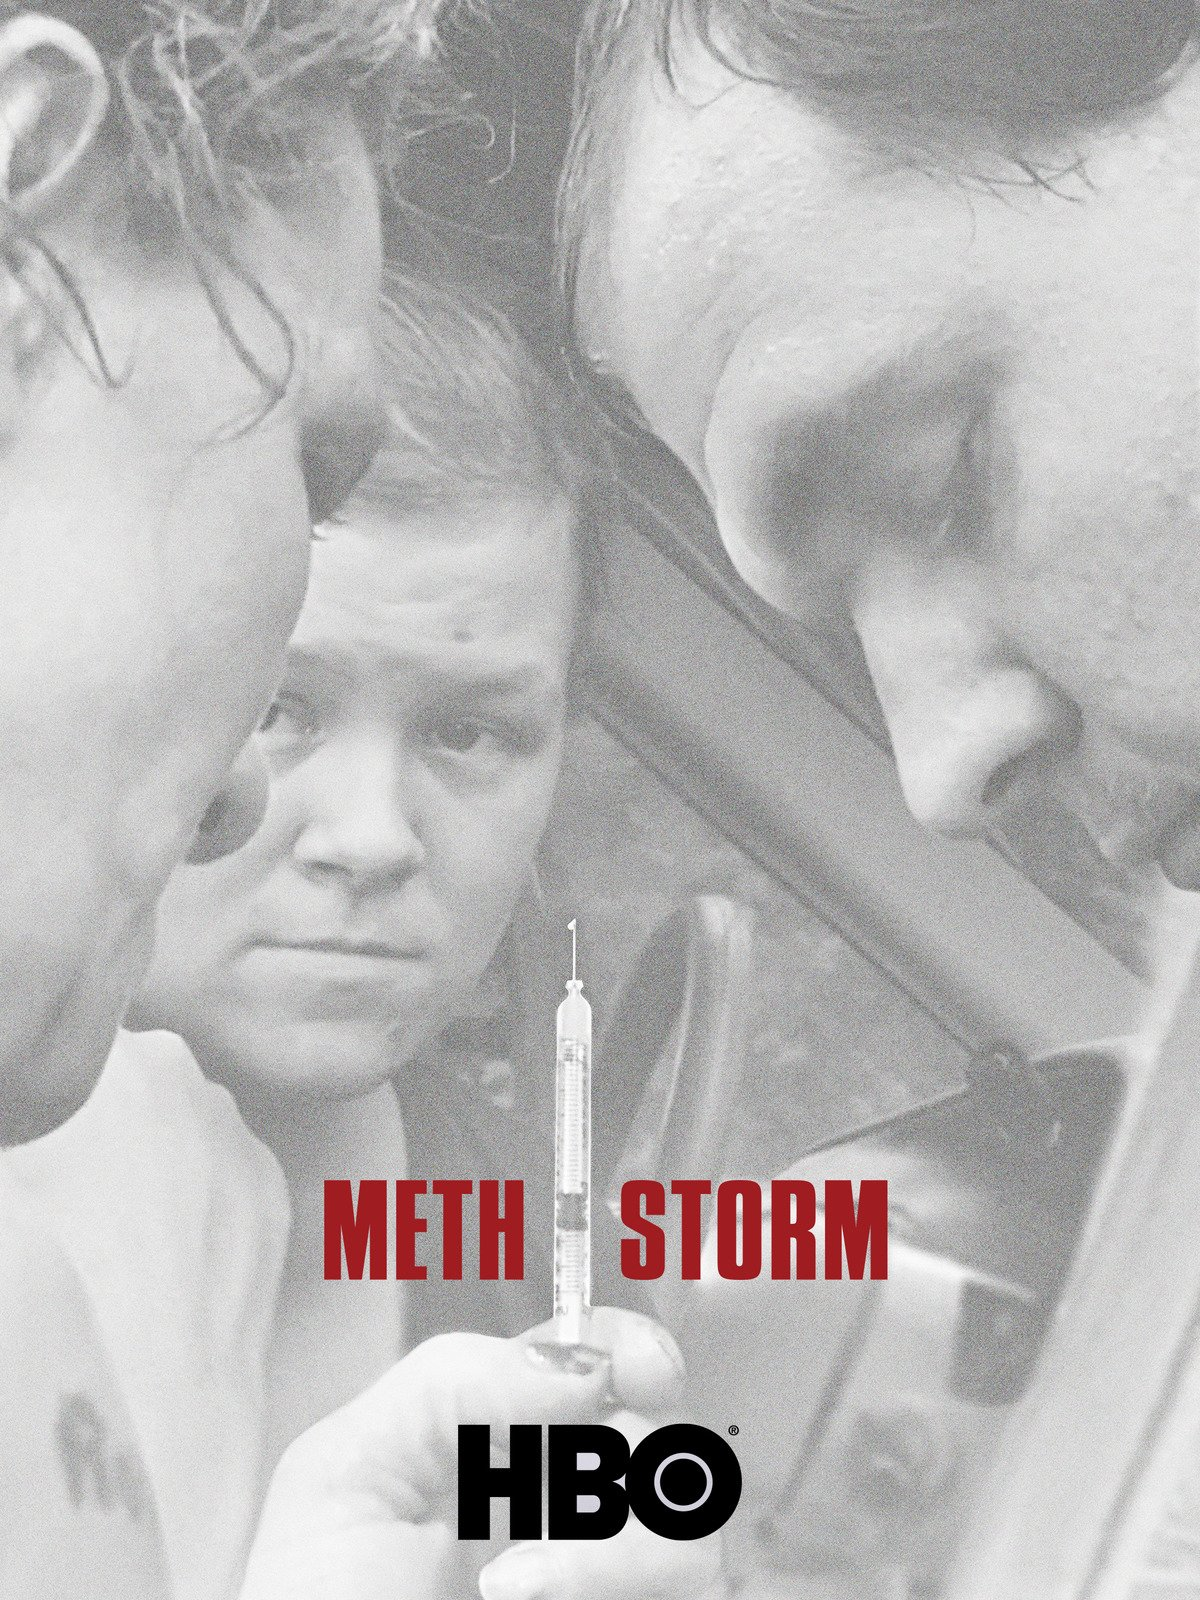 Meth Storm by